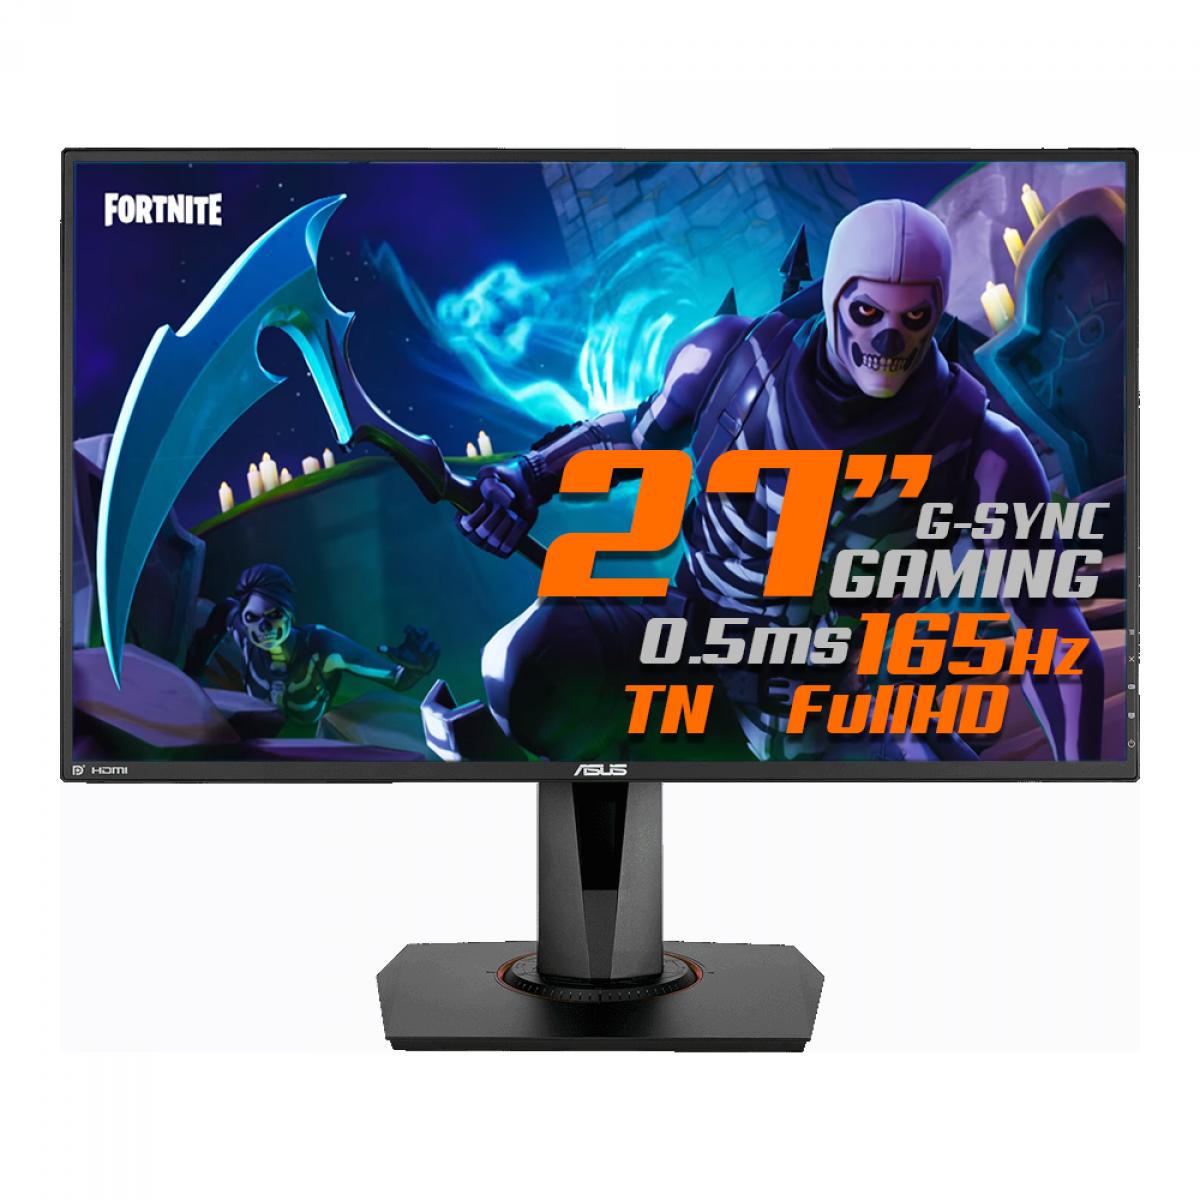 Monitor Gamer ASUS 27 Pol, Full HD, 165Hz, 0,5ms, G-Sync, HDMI/DP/DVI, Altura Ajustável, VG278QR